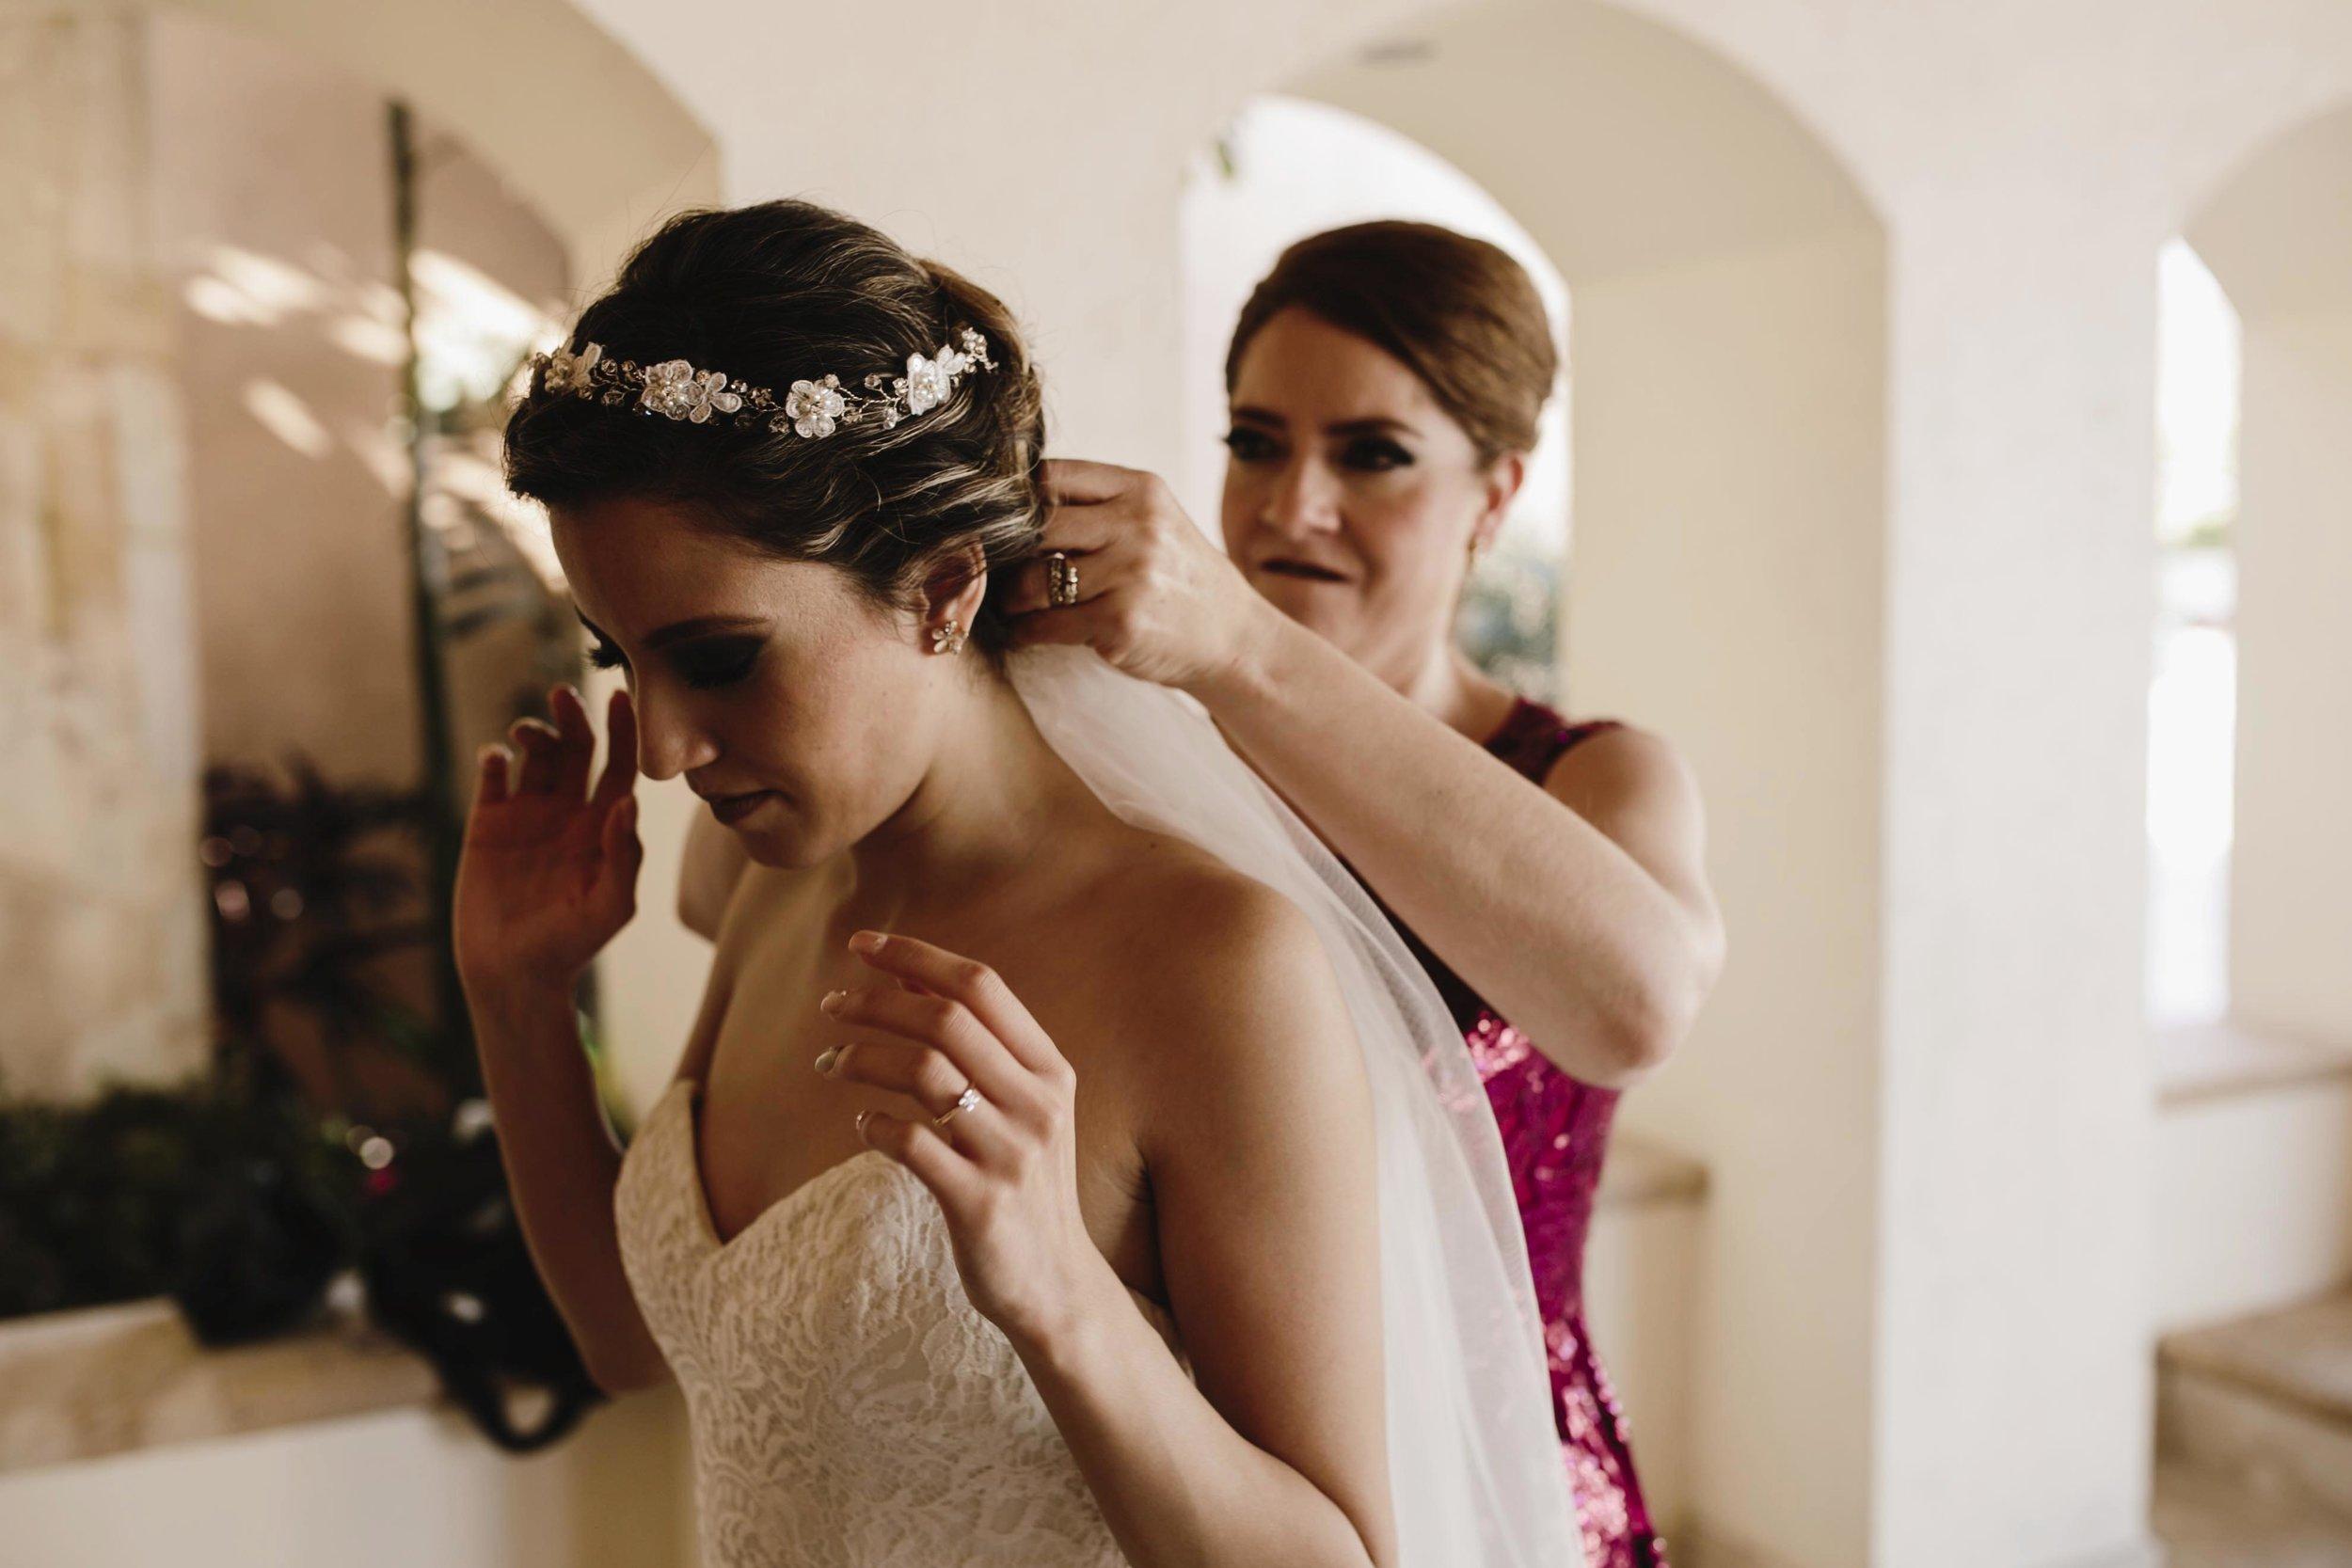 alfonso_flores_destination_wedding_photography_jardin_amarello_cuernavaca50.jpg